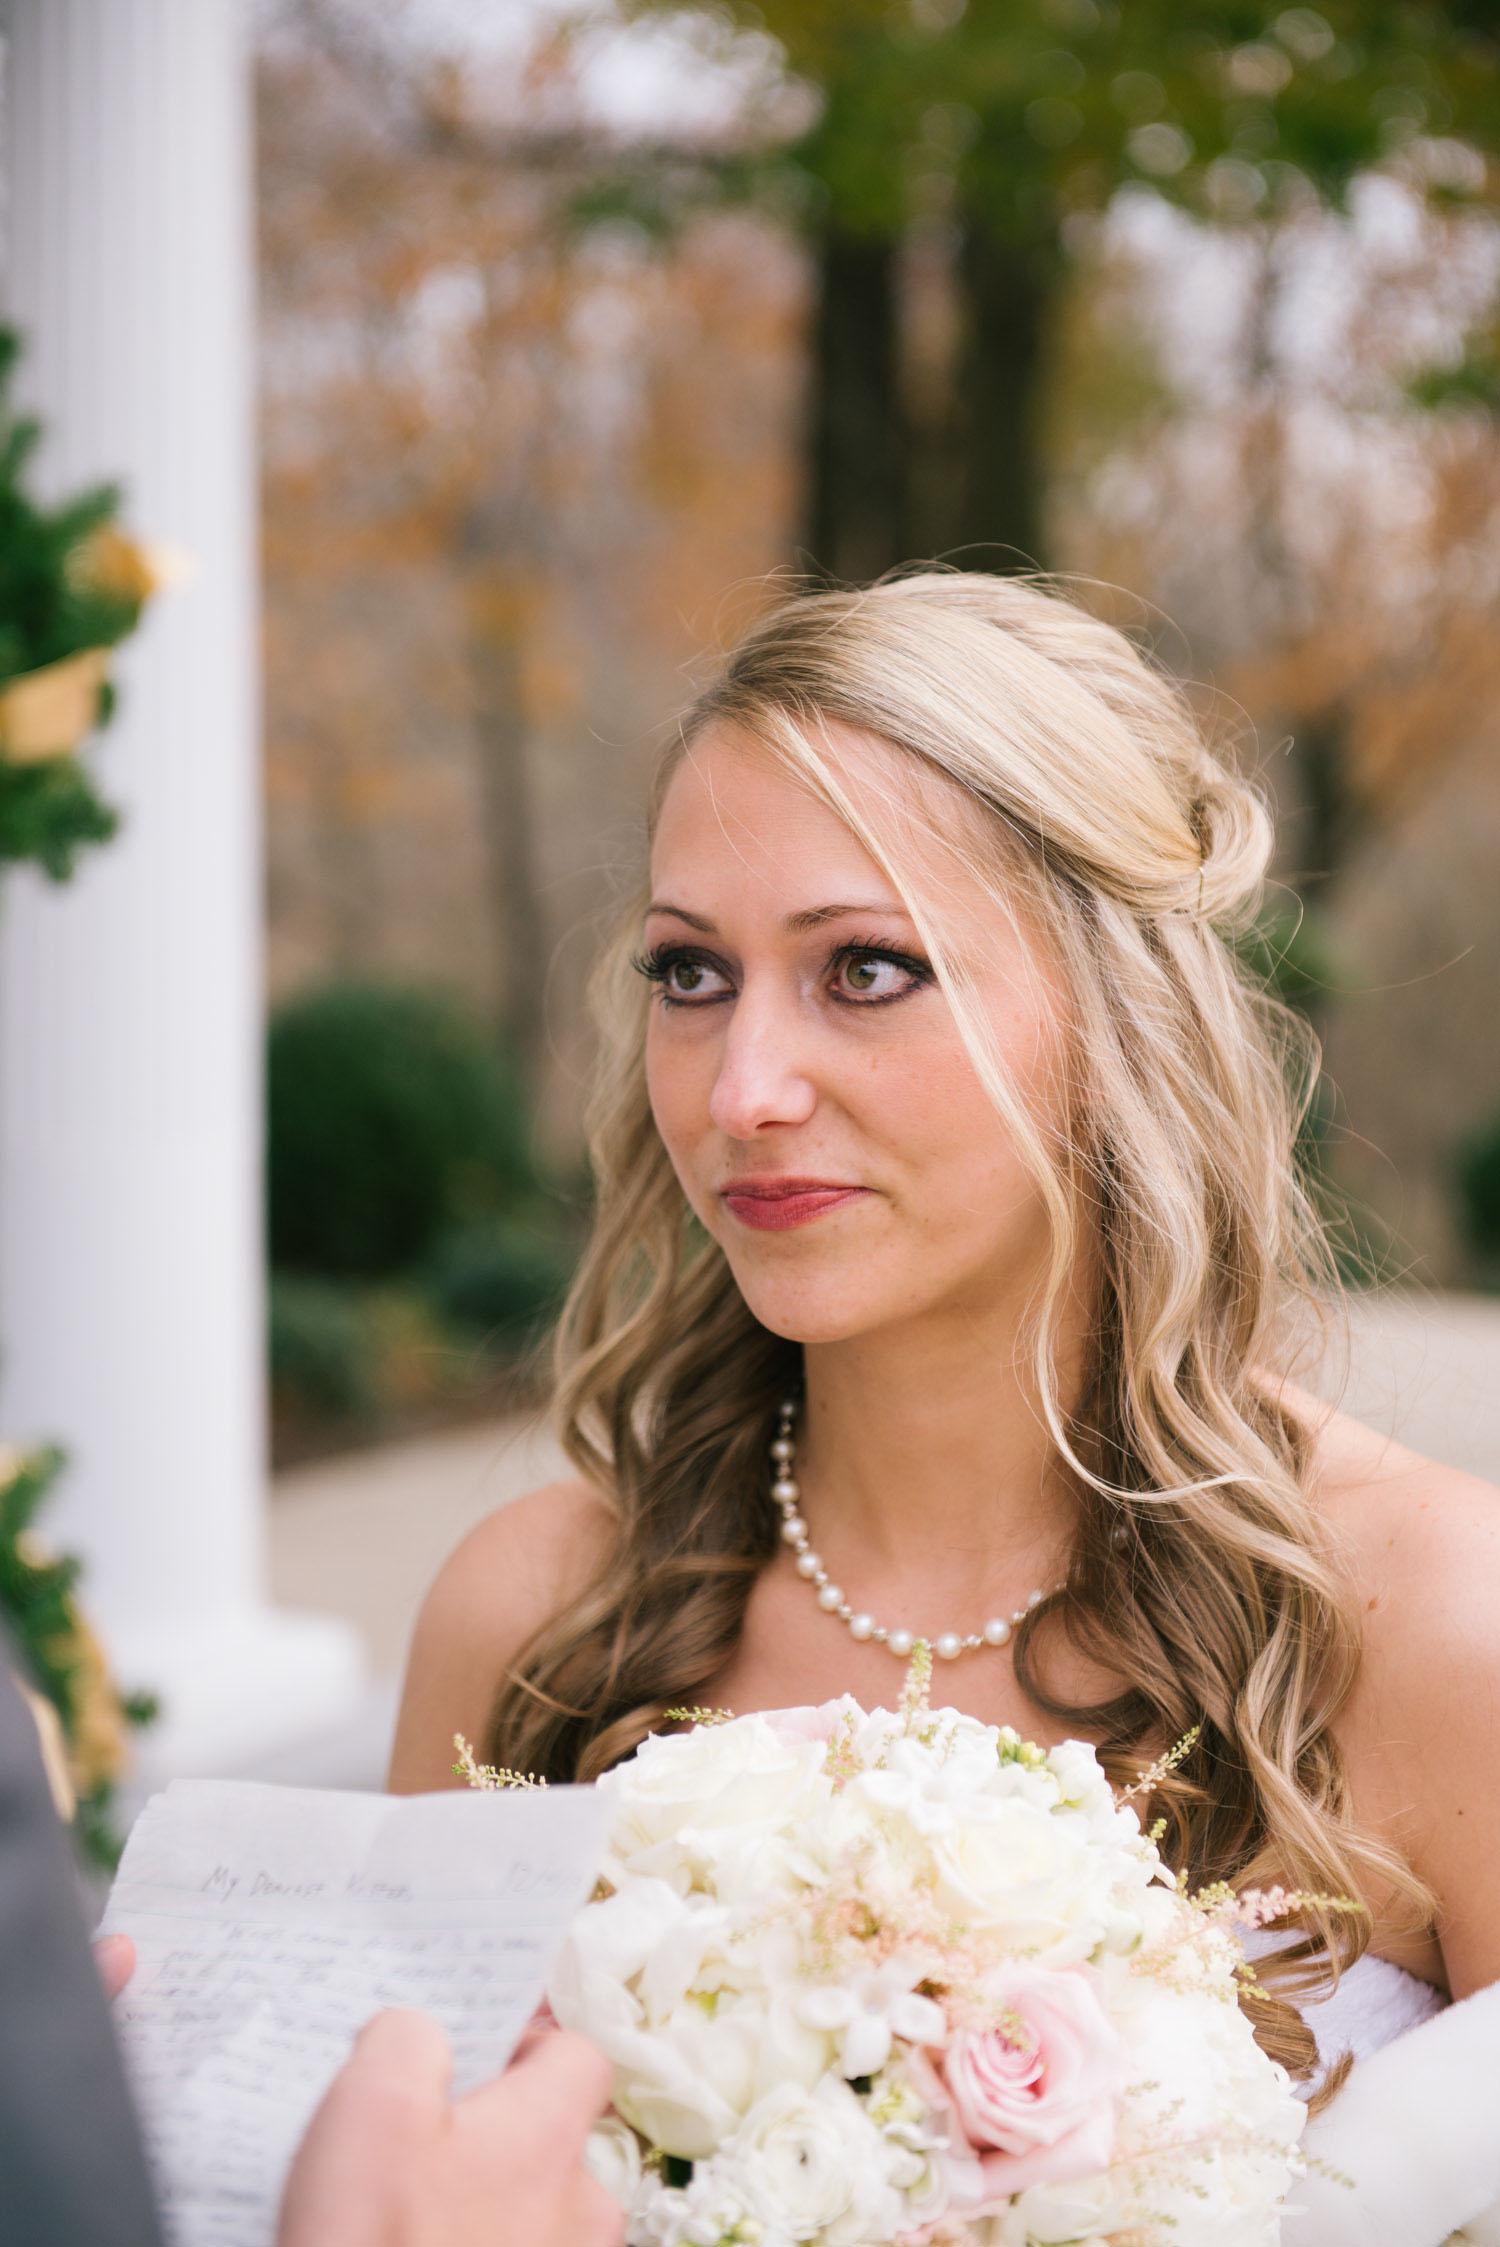 youngstrom-wedding-66.jpg